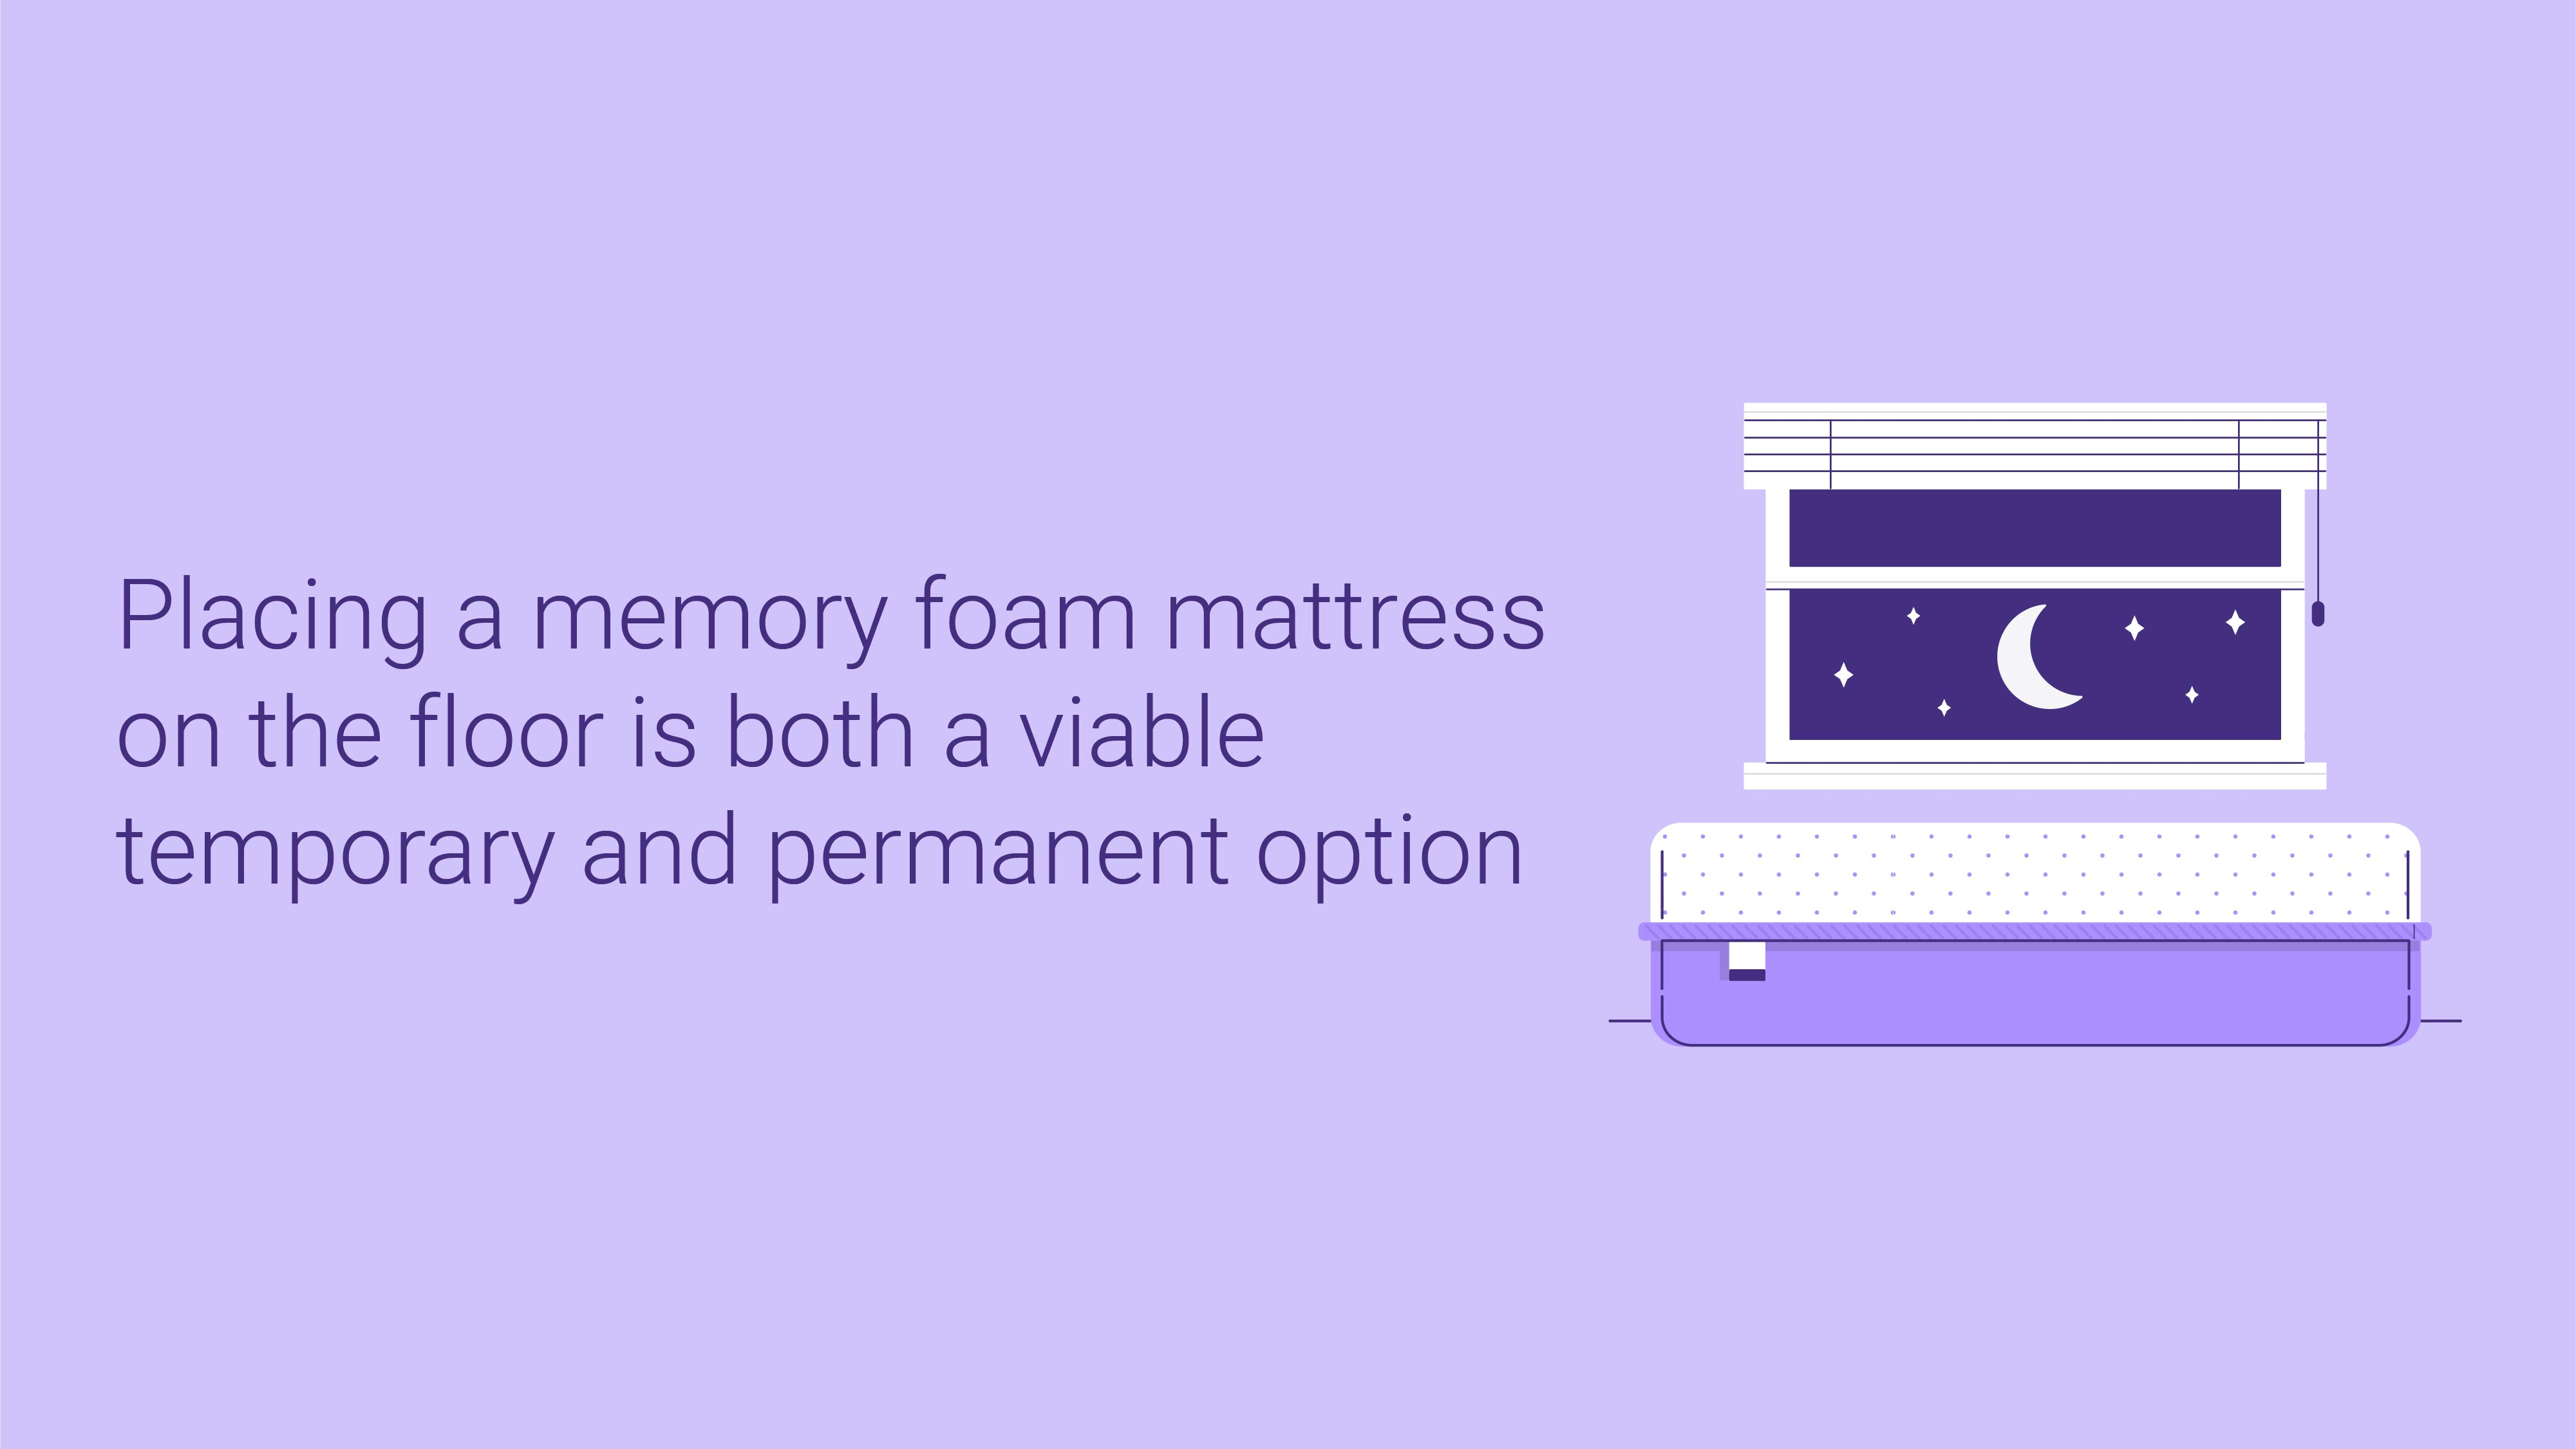 Best Foundation for Memory Foam Mattress